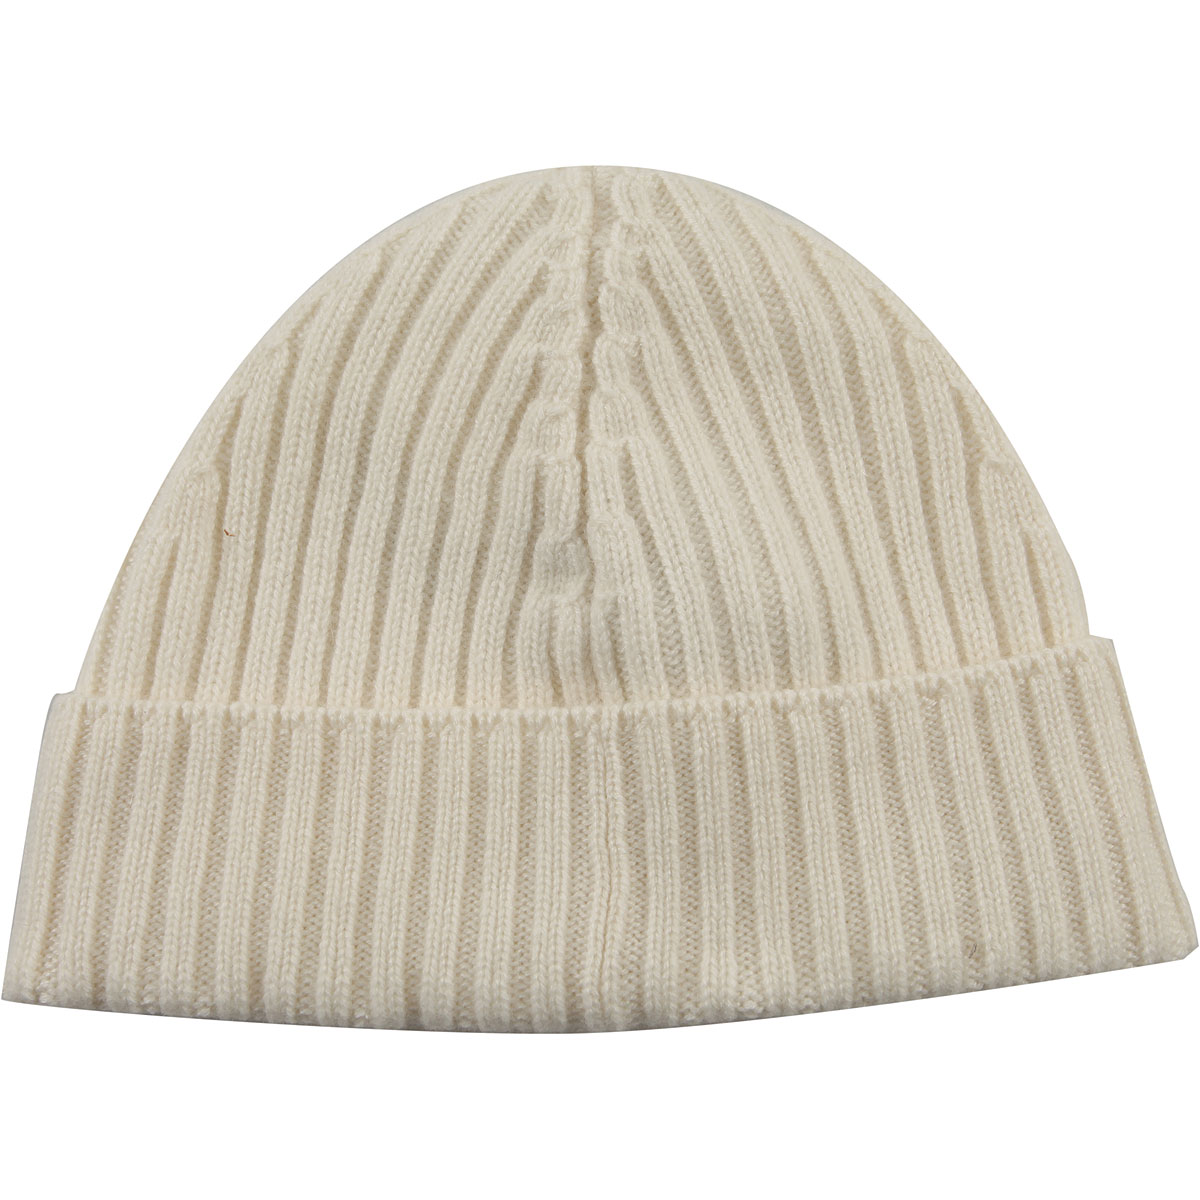 Image of Kangra Hat for Women, Milk White, Cashmere, 2017